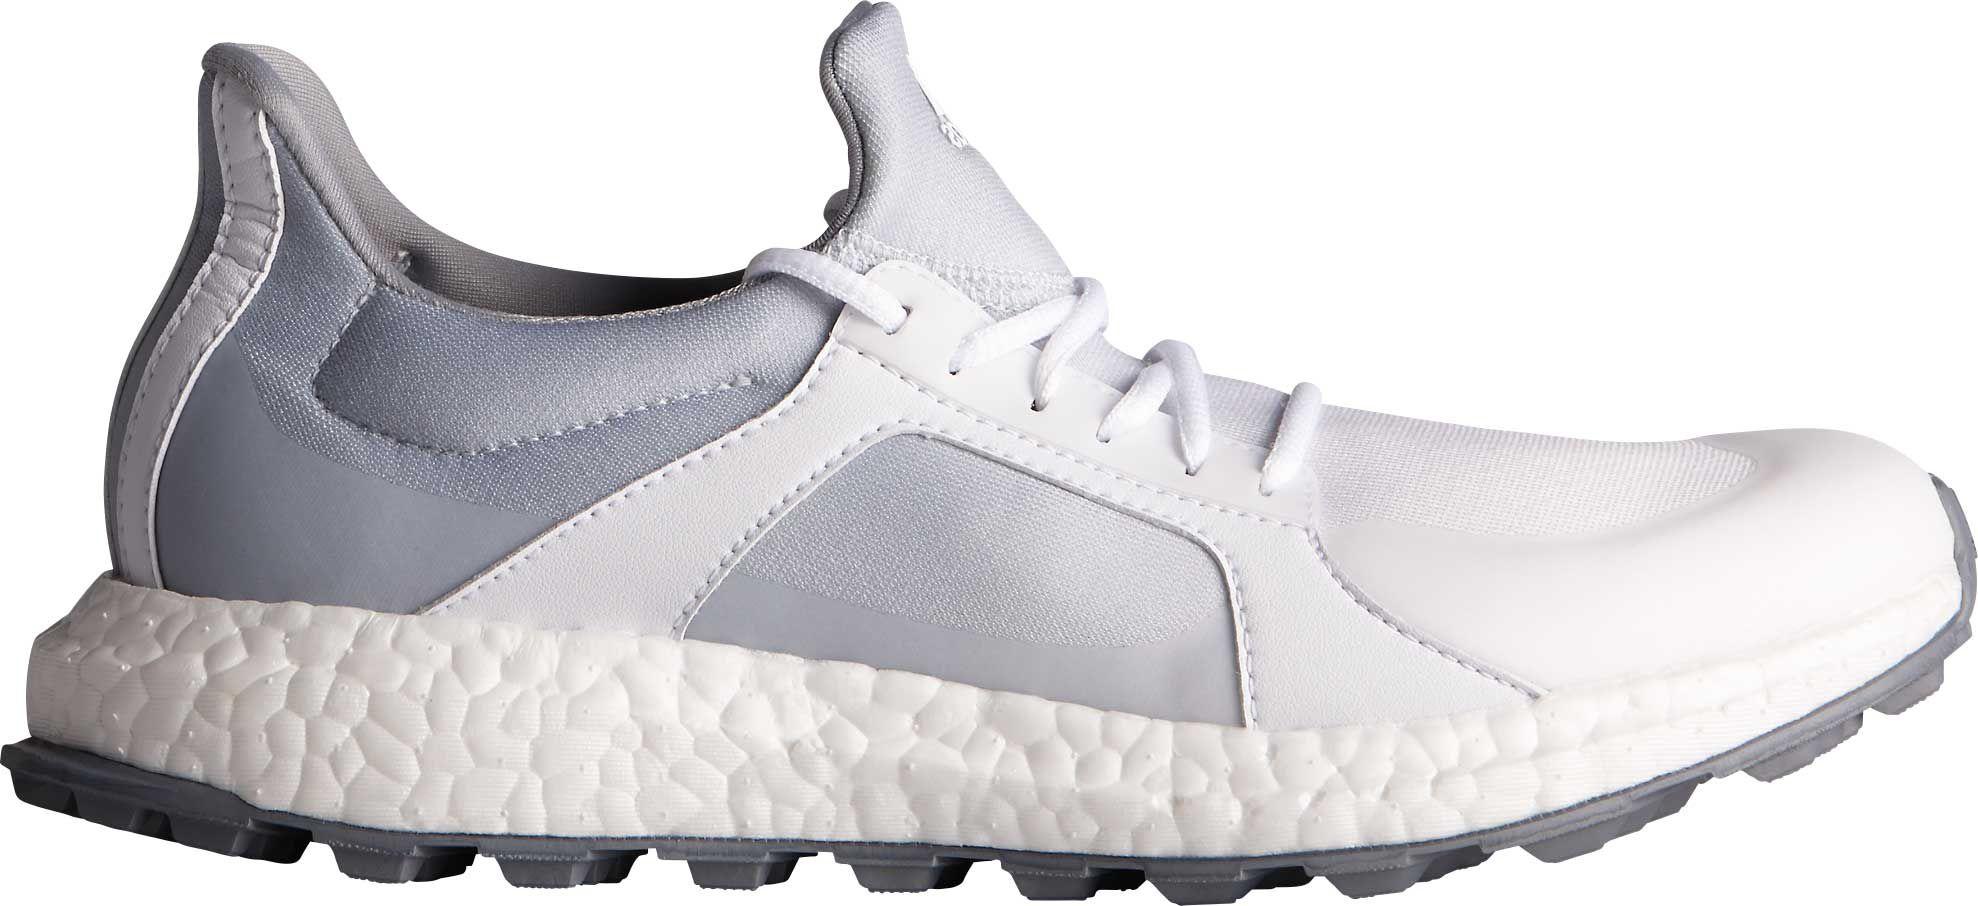 Adidas Crossknit Boost Golf Shoes White 594ba9